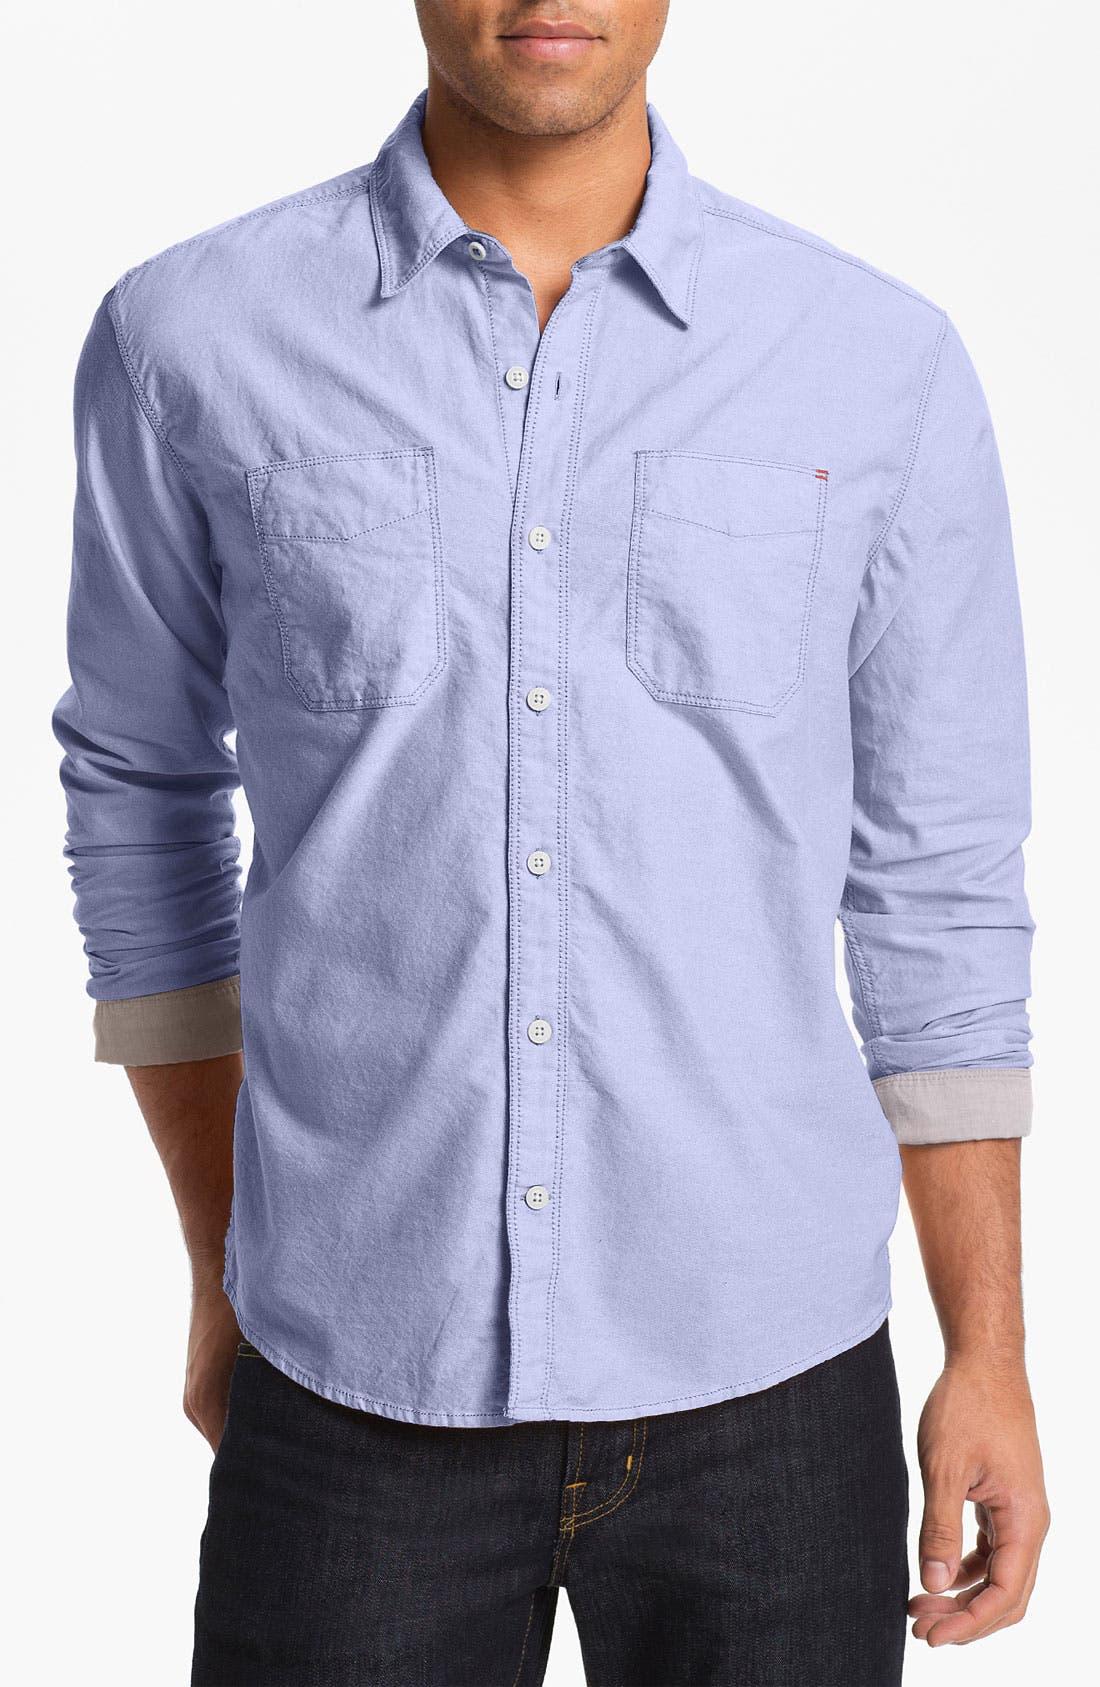 Alternate Image 1 Selected - Cutter & Buck 'Phelps Oxford' Regular Fit Sport Shirt (Big & Tall)